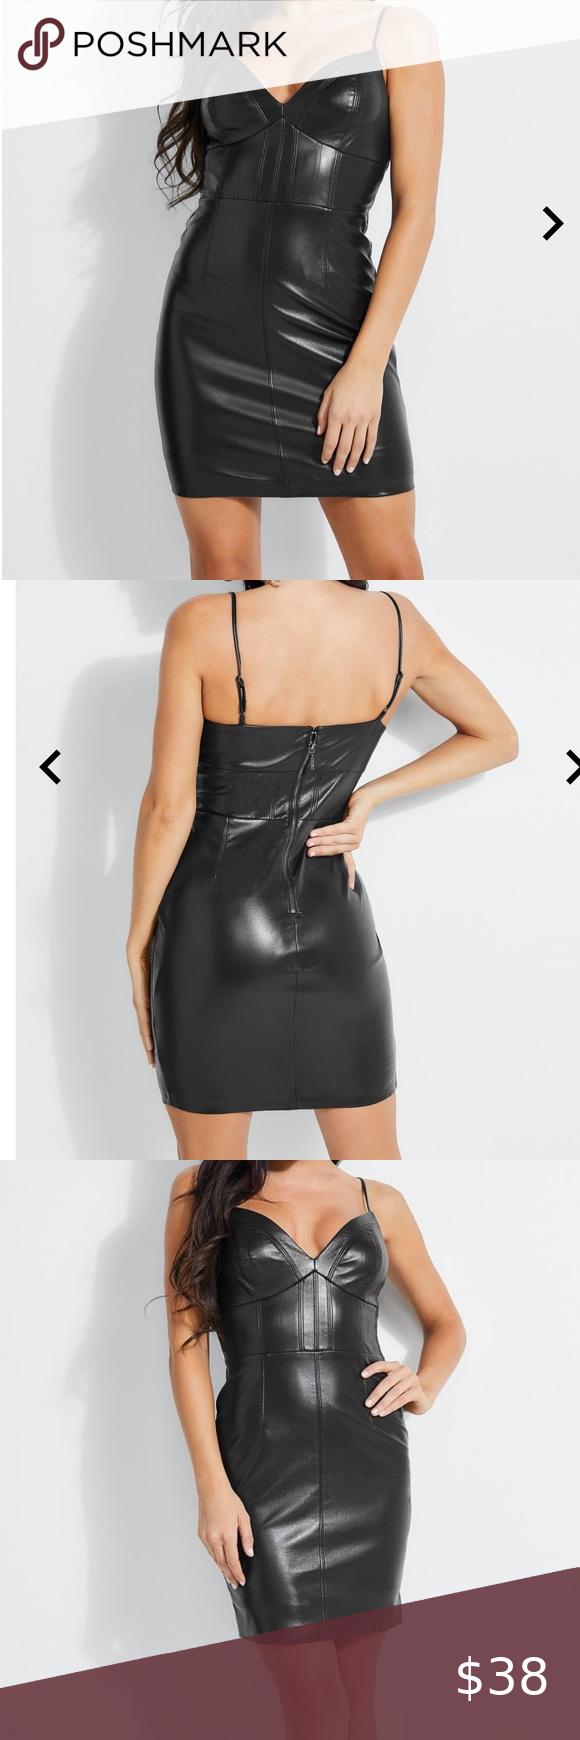 Guess Leather Bodycon Dress Leather Bodycon Dress Bodycon Dress Clothes Design [ 1740 x 580 Pixel ]